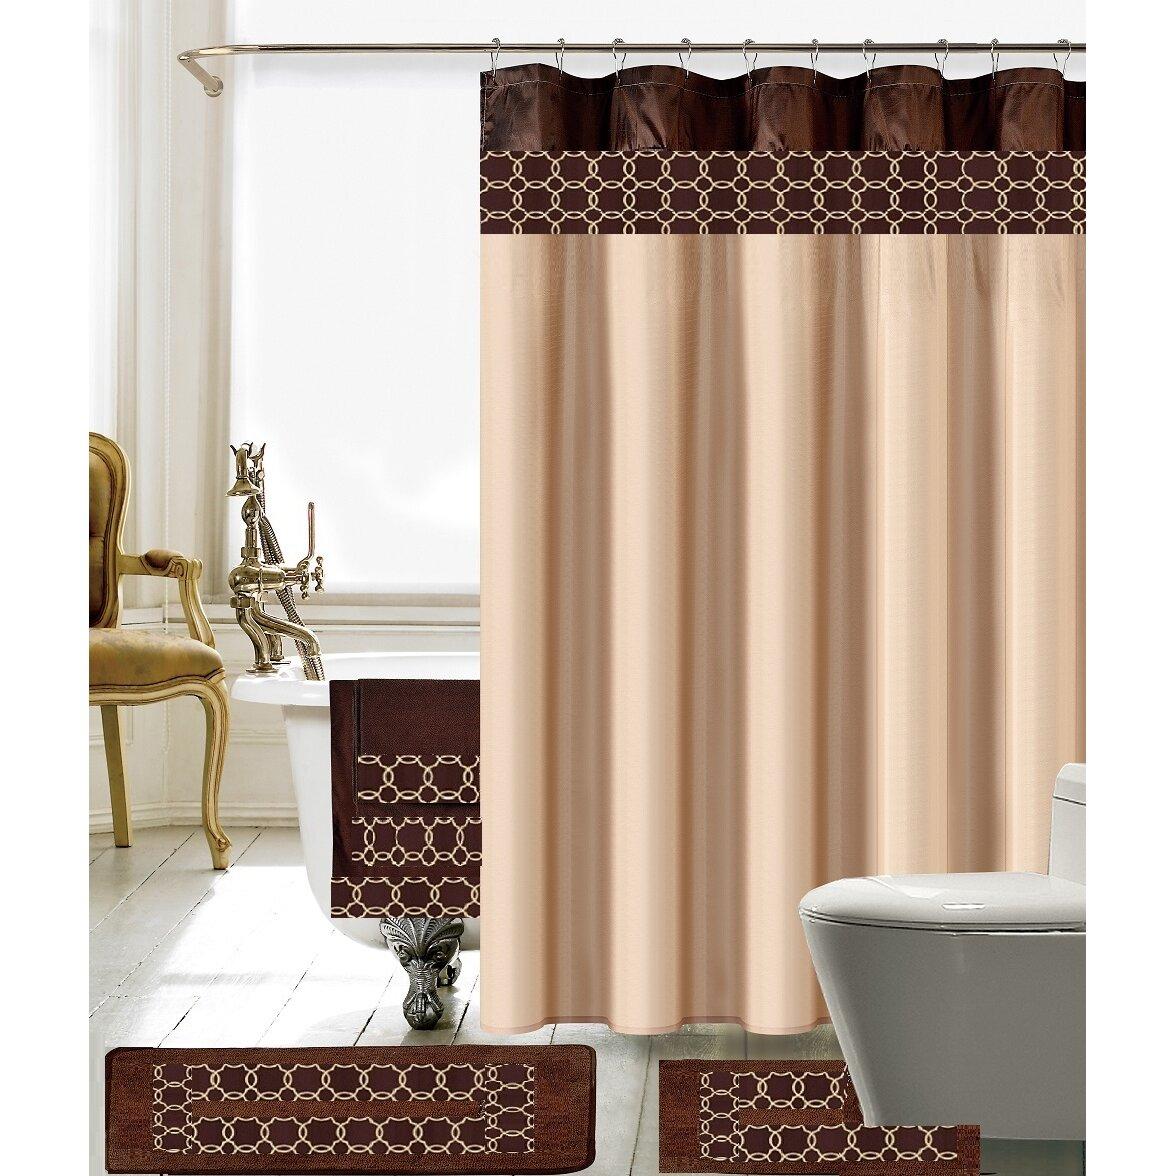 Daniels Bath 18 Piece Embroidery Shower Curtain Set